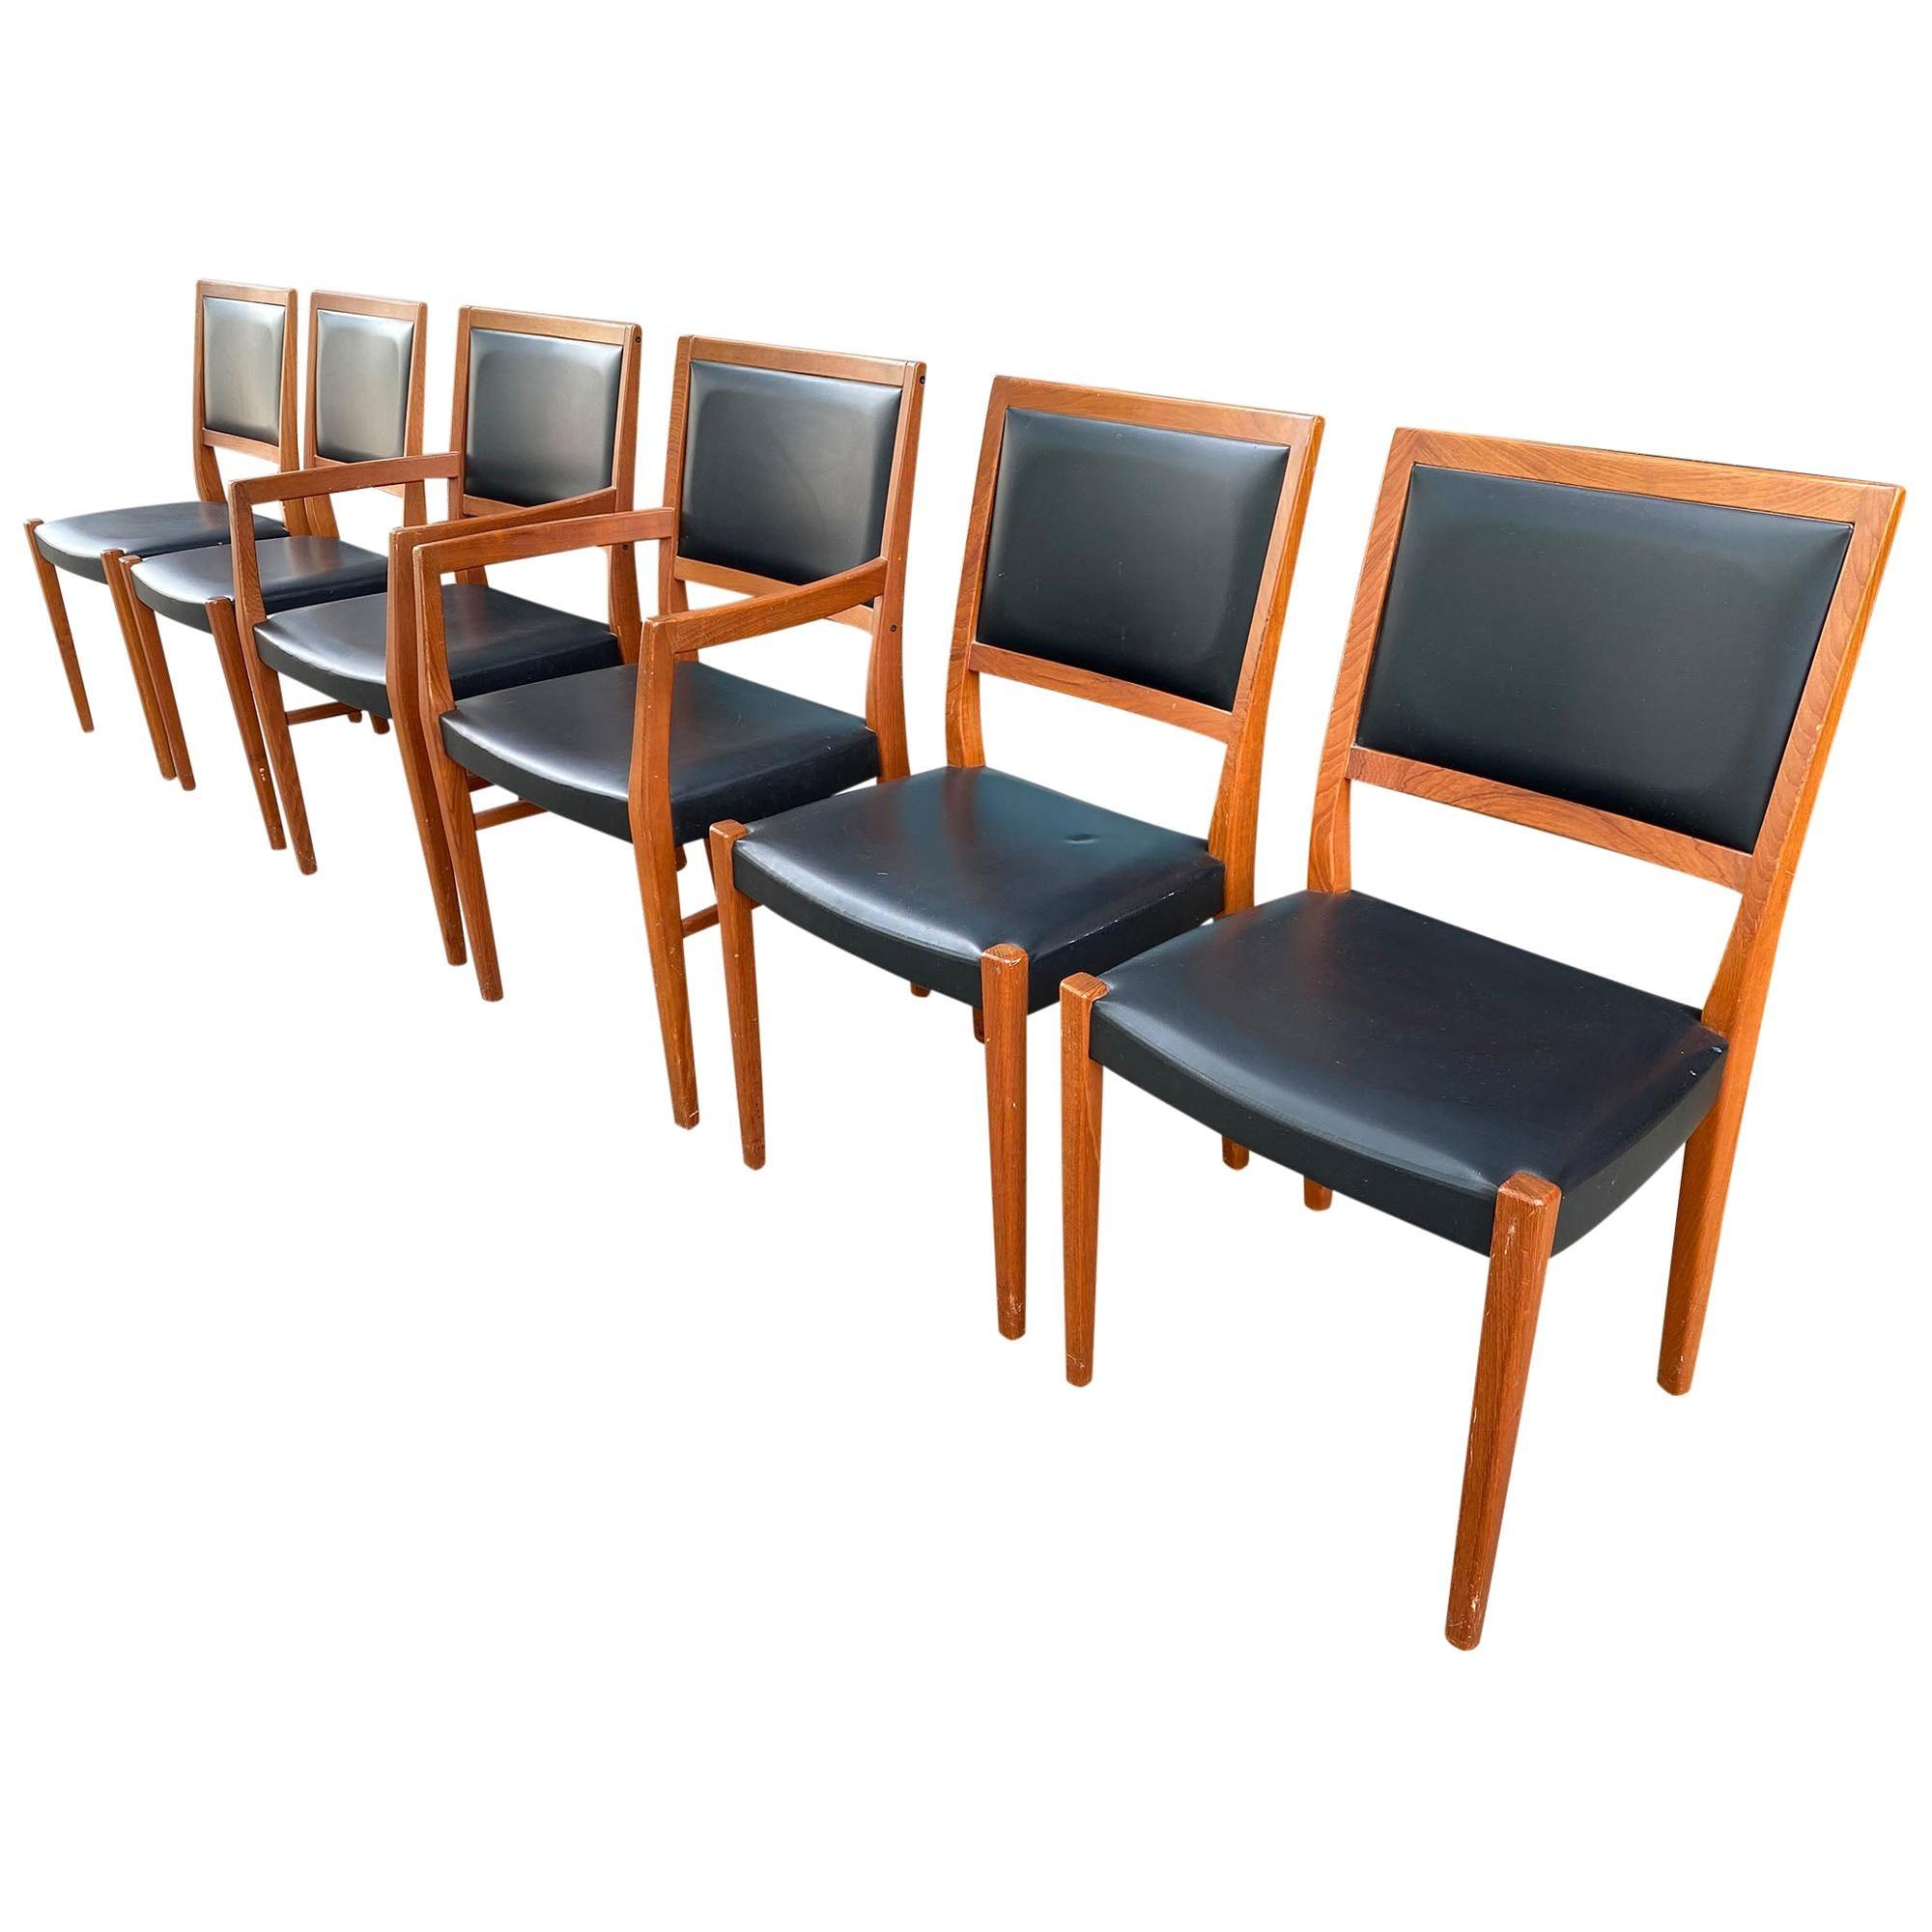 Midcentury Svegards Markaryd 6 Teak Dining Chairs Made in Sweden Black Vinyl